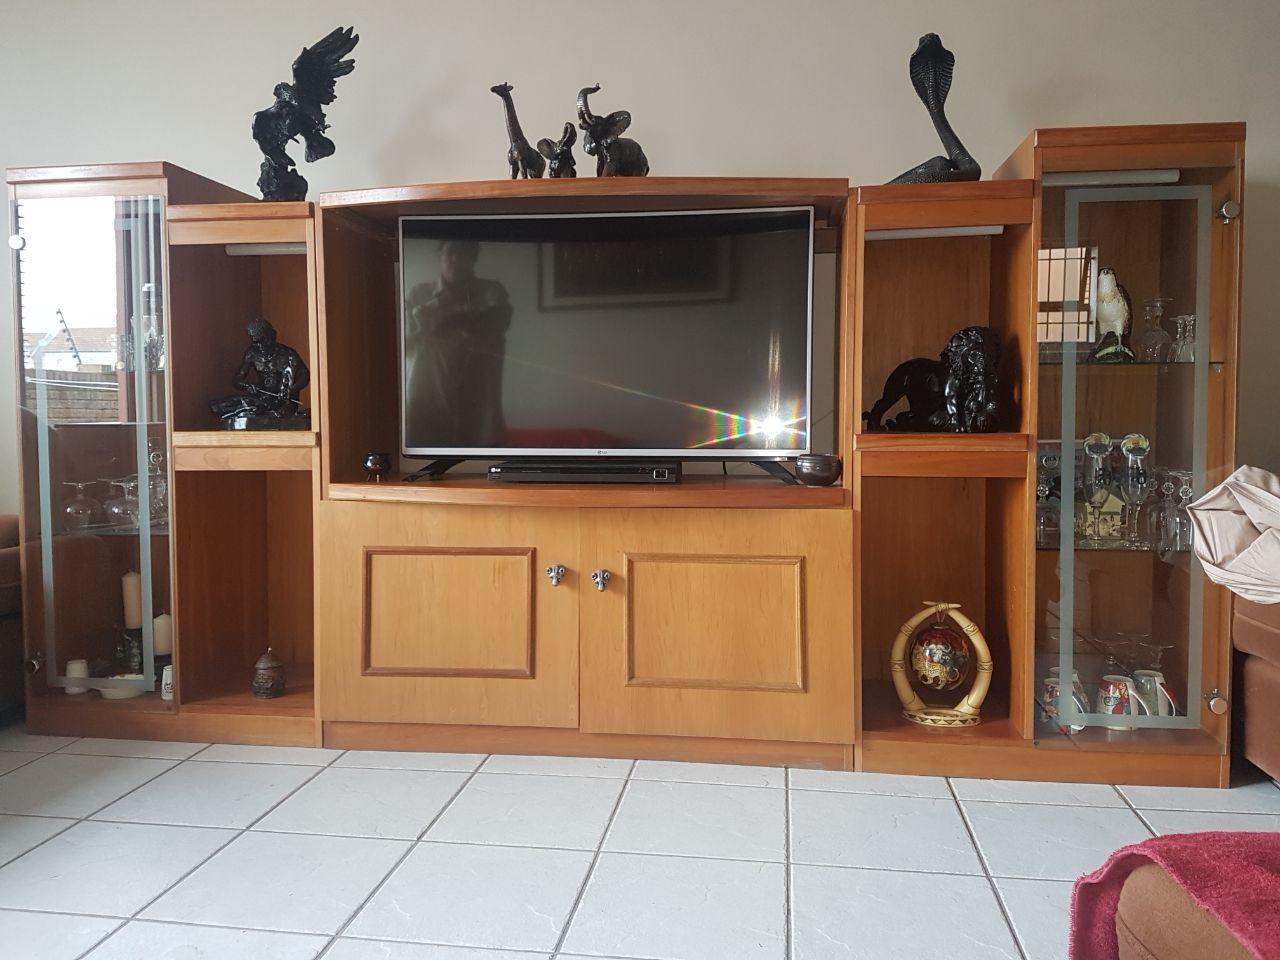 TV / DISPLAY OAK CABINET